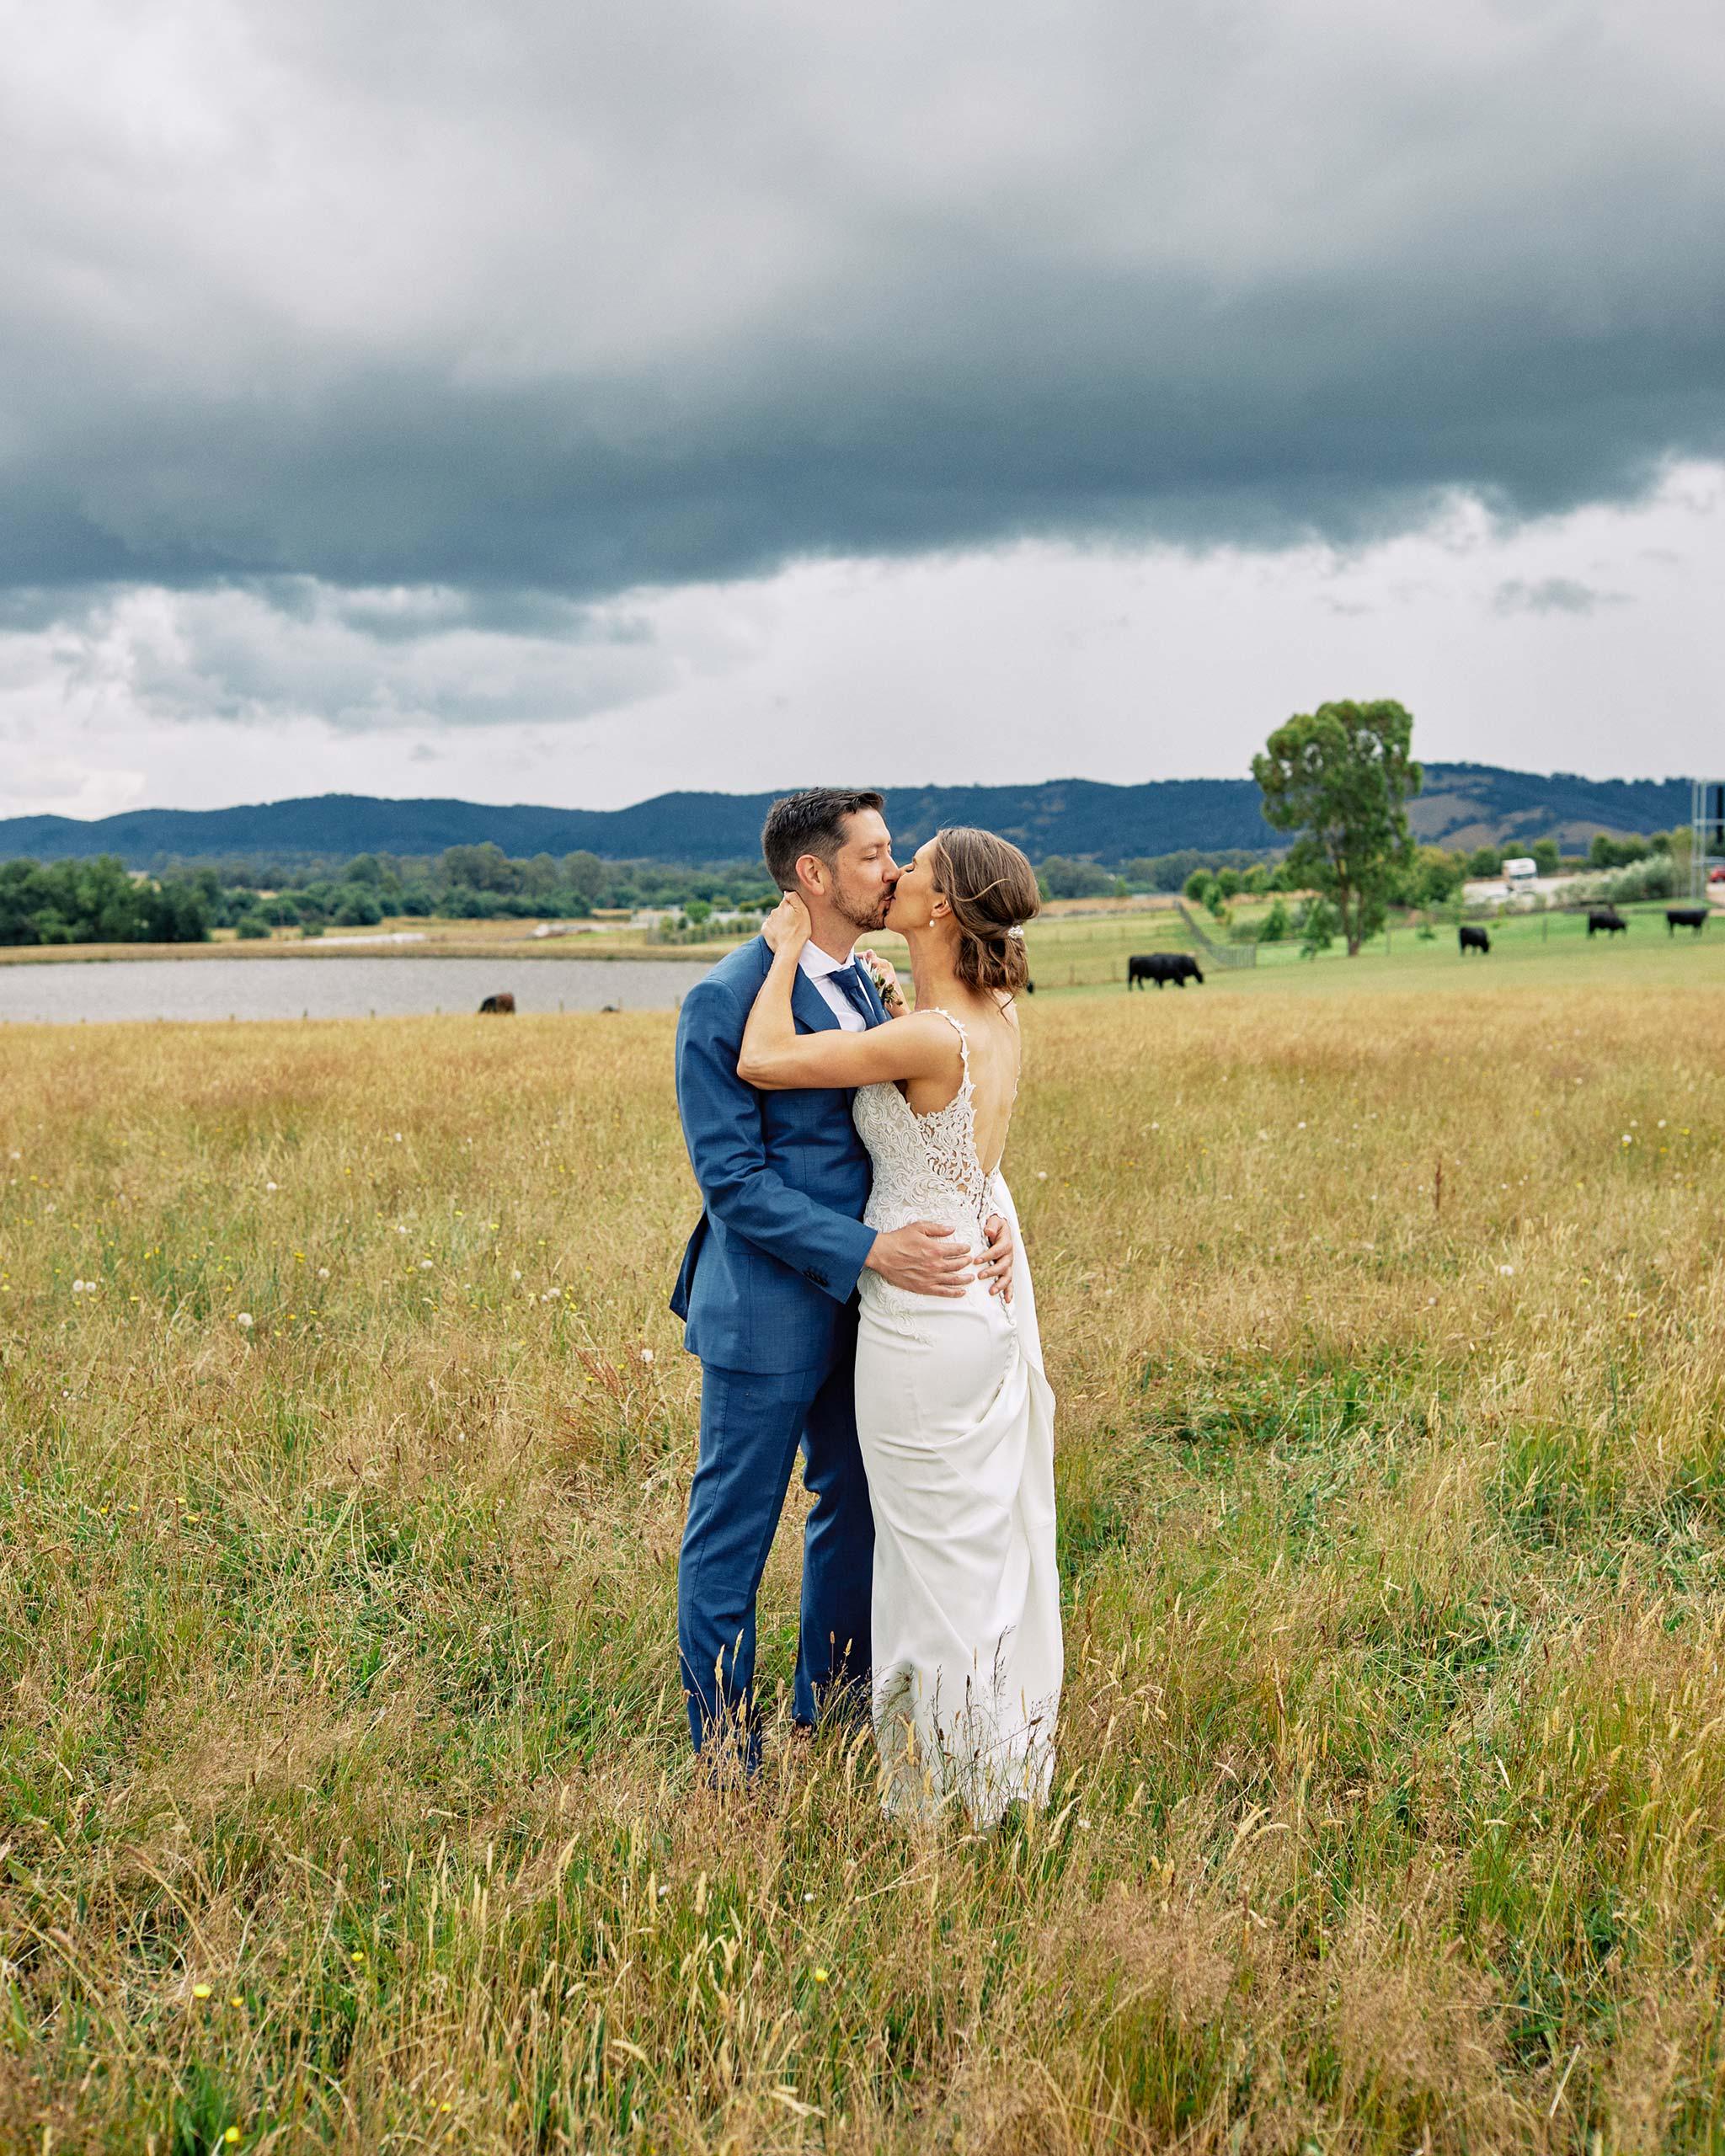 Zonzo estate wedding cloudy day